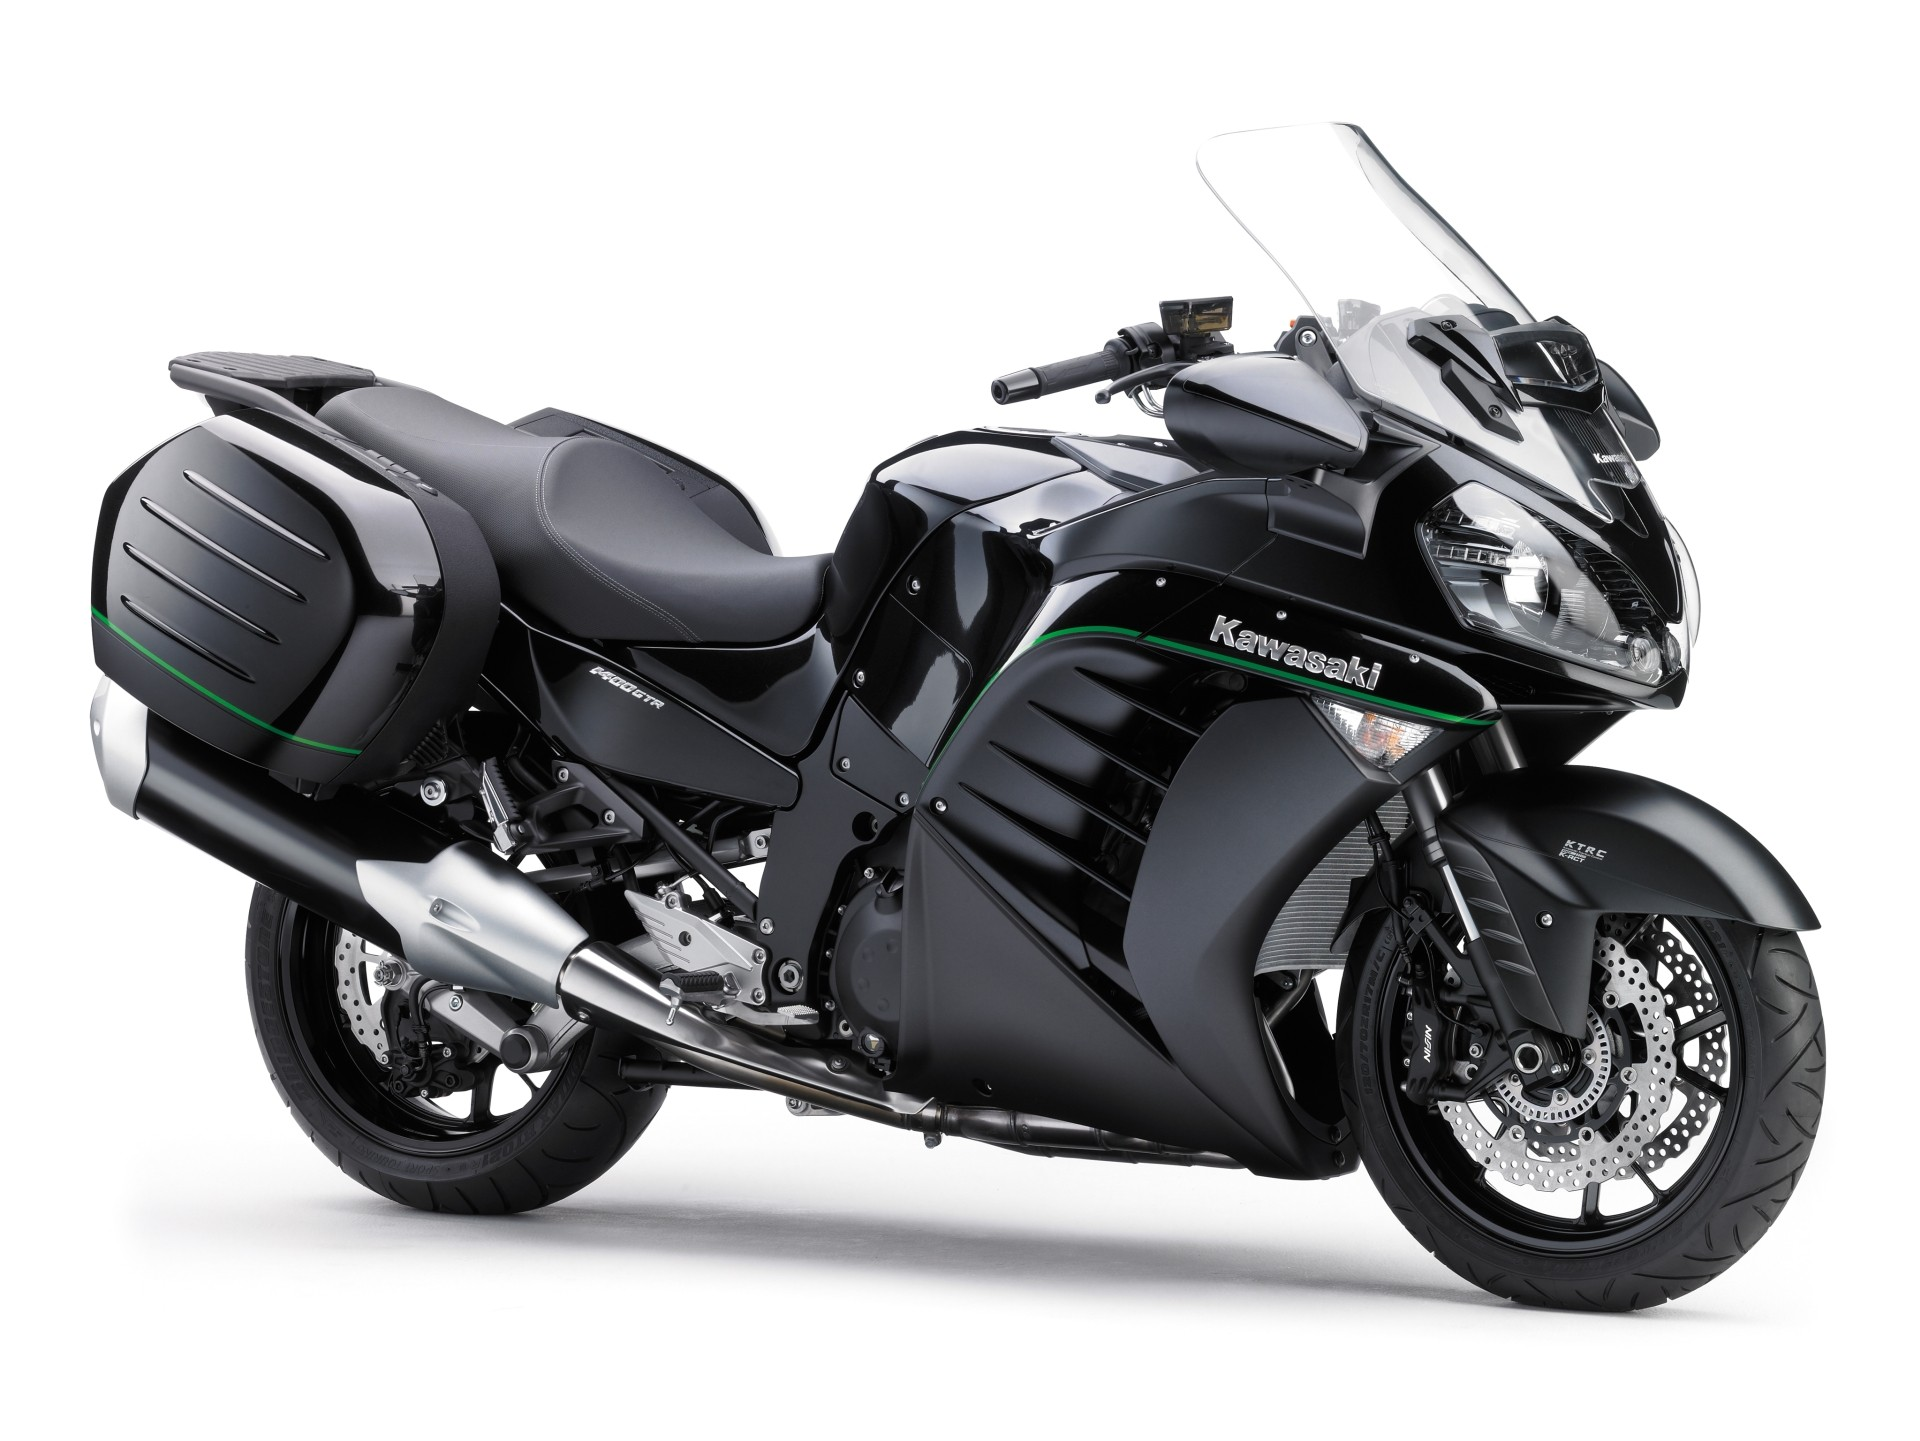 2019 Kawasaki Z900RS Cafe Guide • Total Motorcycle